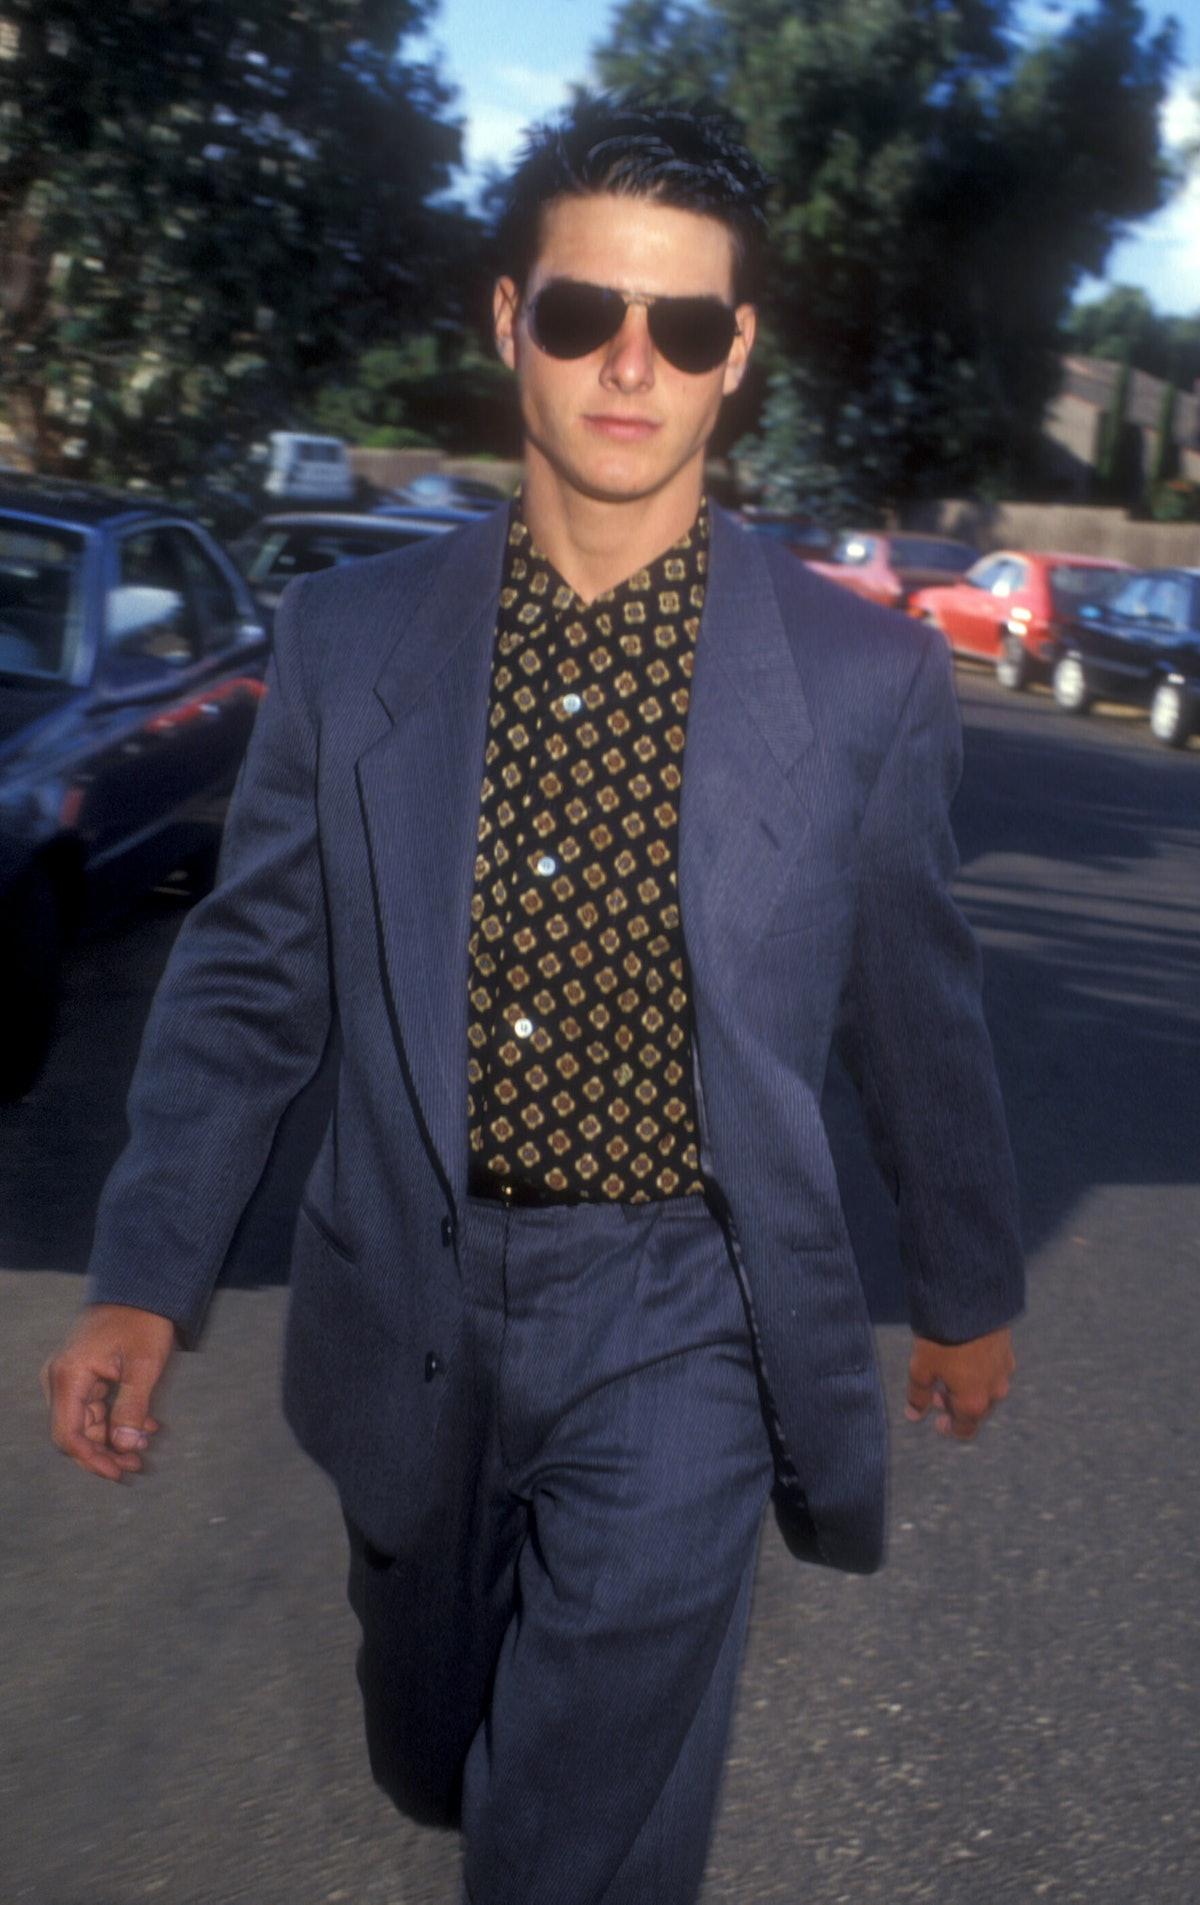 Madonna and Sean Penn Wedding - August 16, 1985 - Arrivals